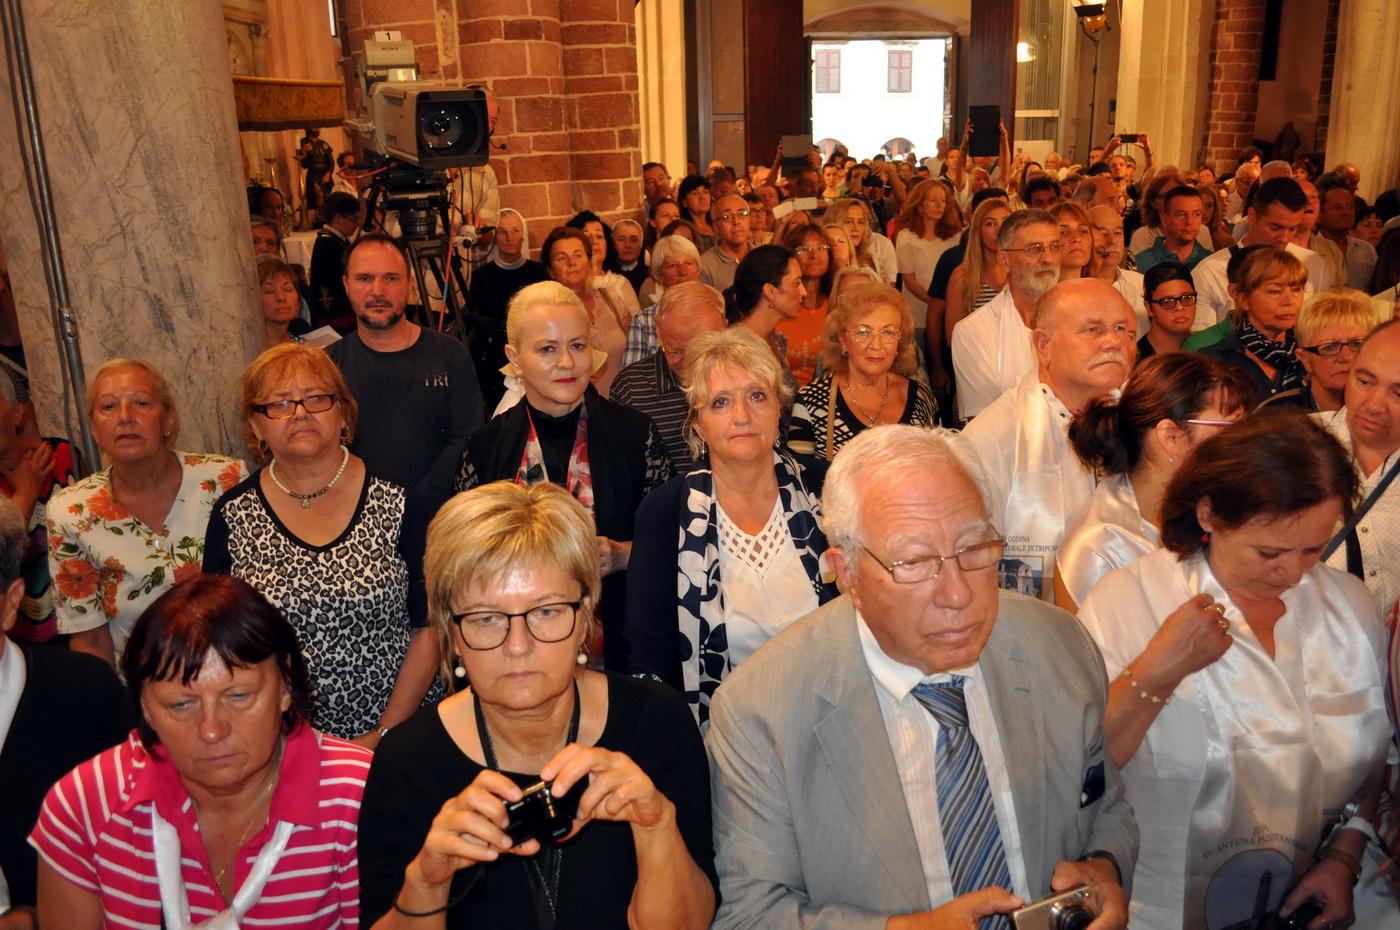 Proslava 850 godina posvete katedrale Svetog Tripuna